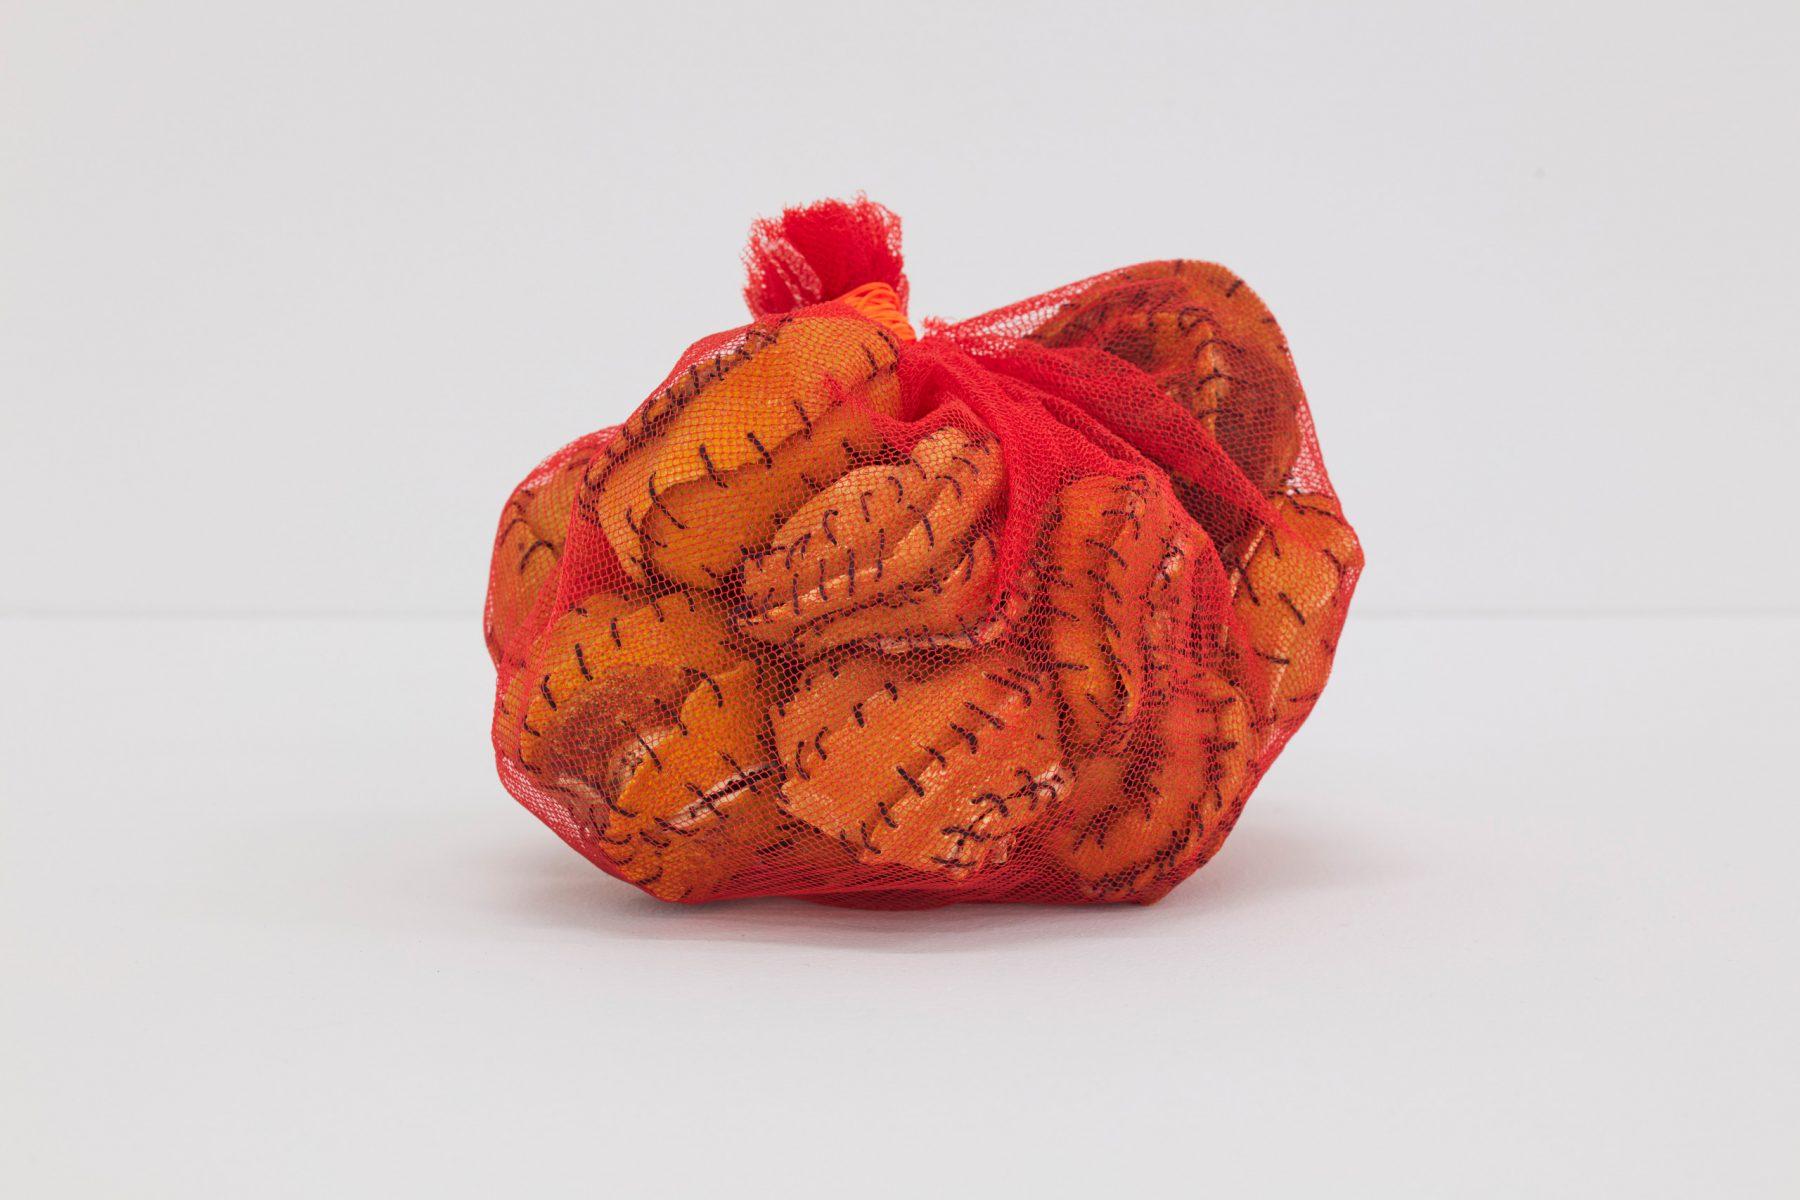 Veronica Ryan, Pouch (2020). Net, orange peels, thread.